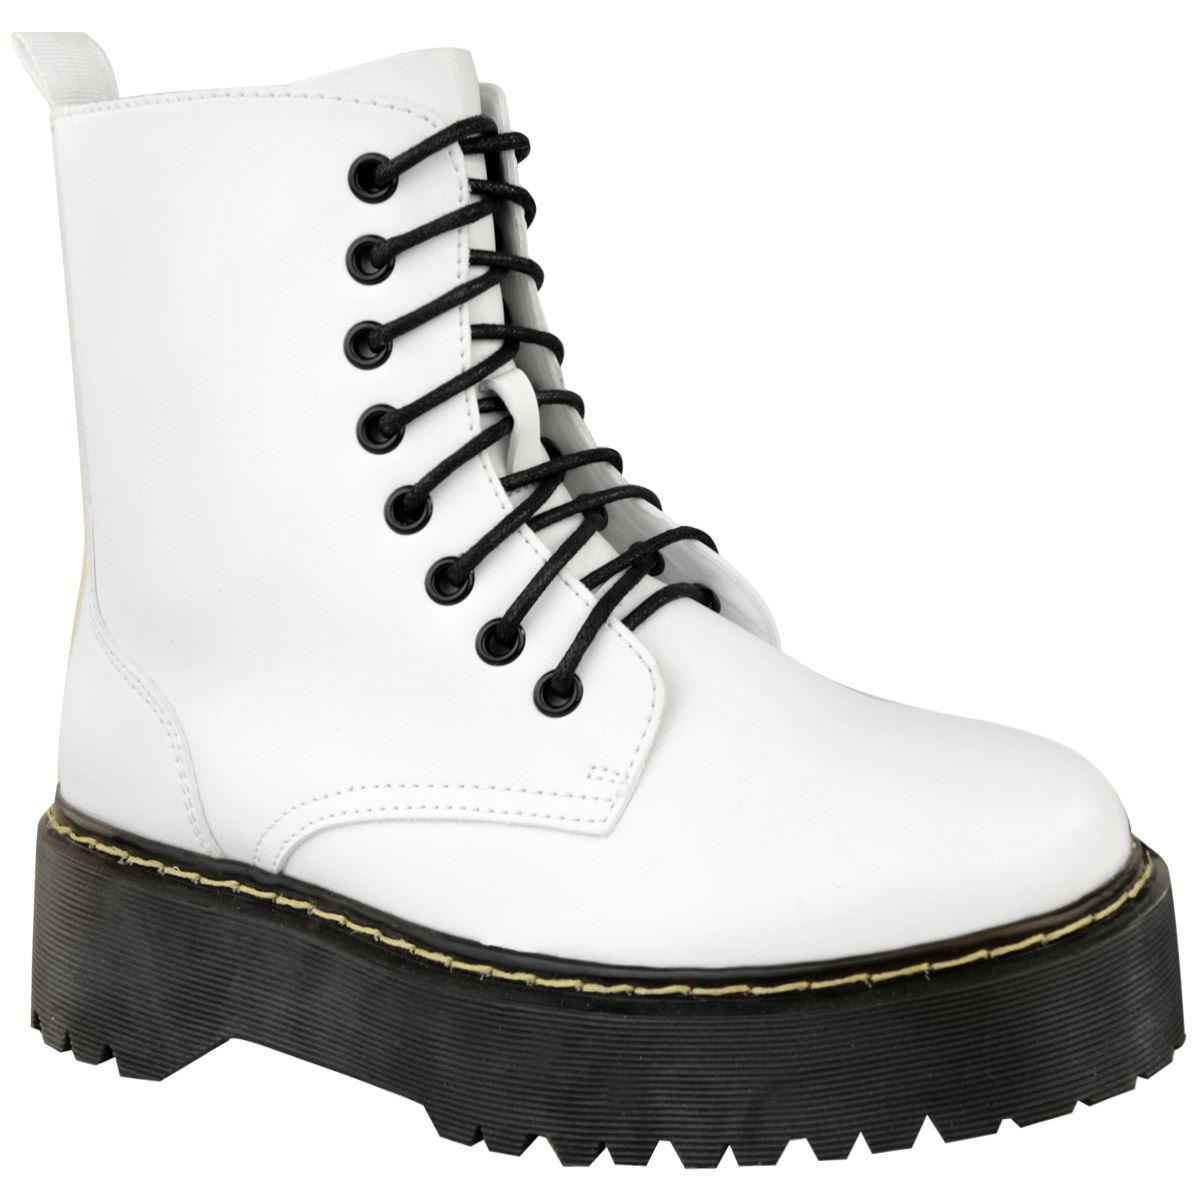 Womens-Ladies-Chunky-Lace-Up-Ankle-Boots-Platform-Icon-Retro-Goth-Punk-Black miniatuur 18